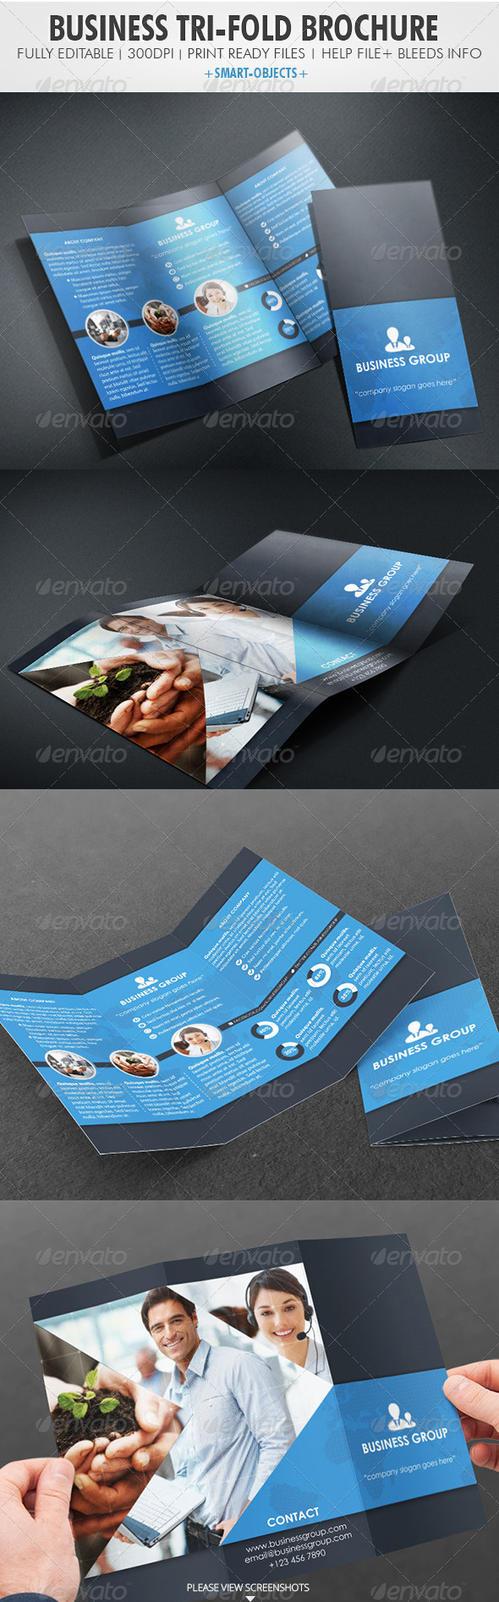 Business Tri-fold Brochure by vitalyvelygo